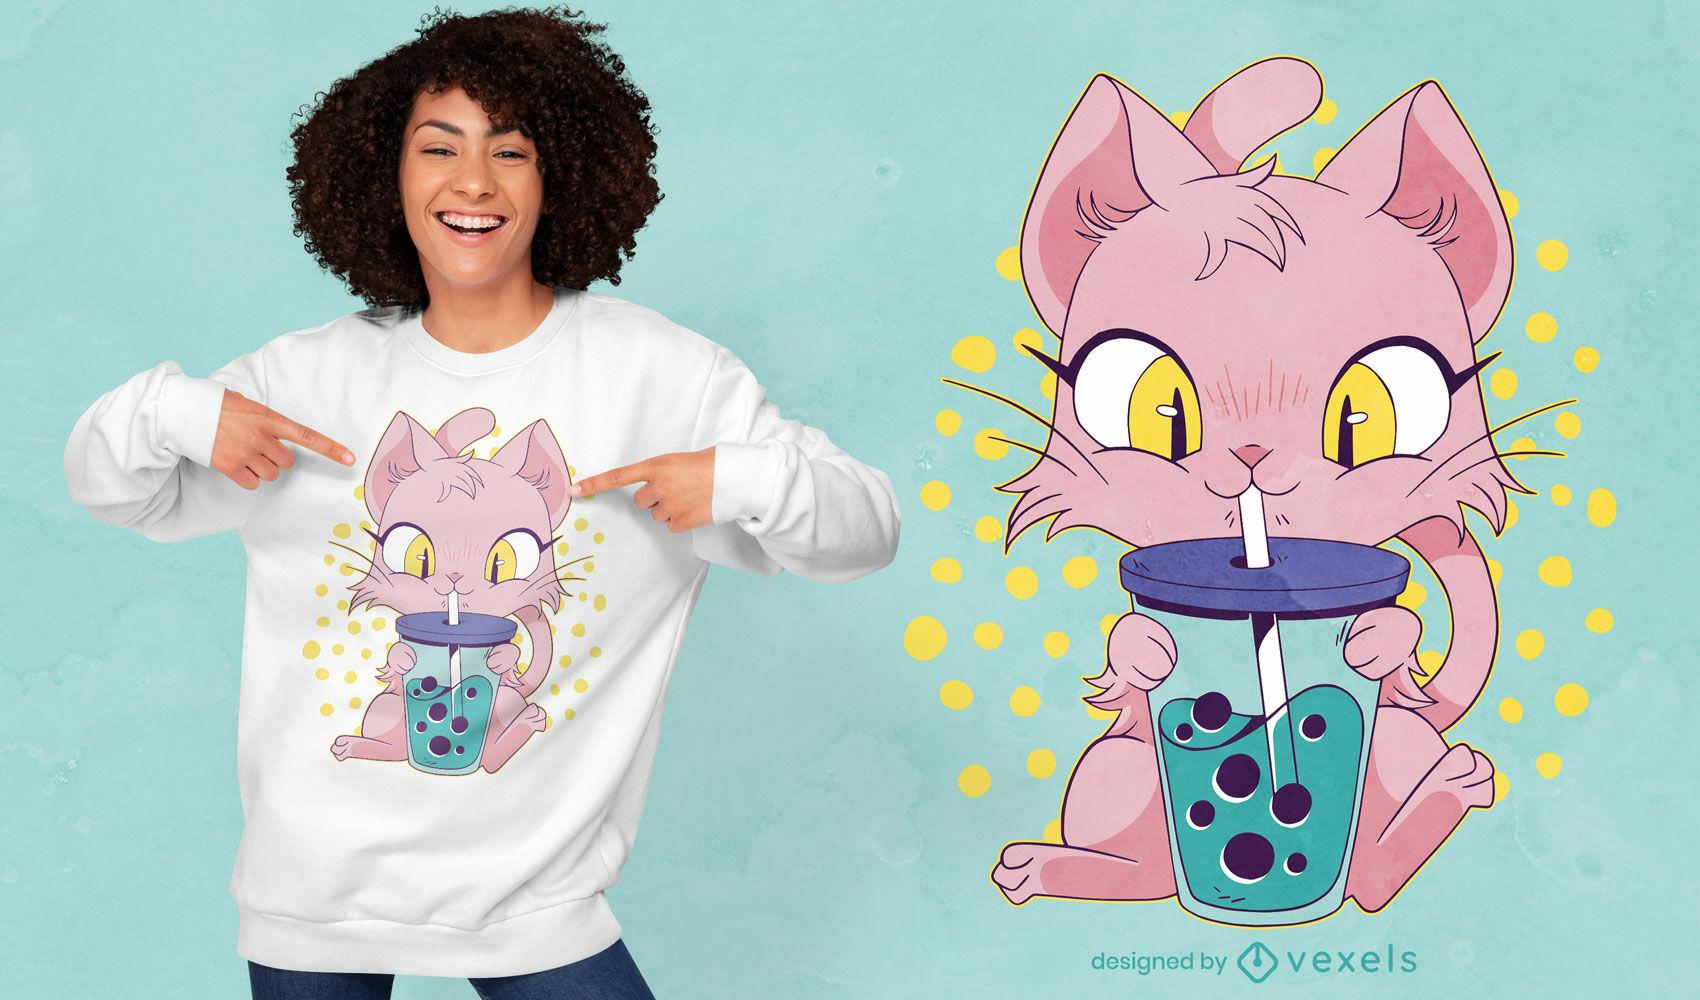 Niedliche Anime-Katze trinkt Boba-Tee-T-Shirt-Design